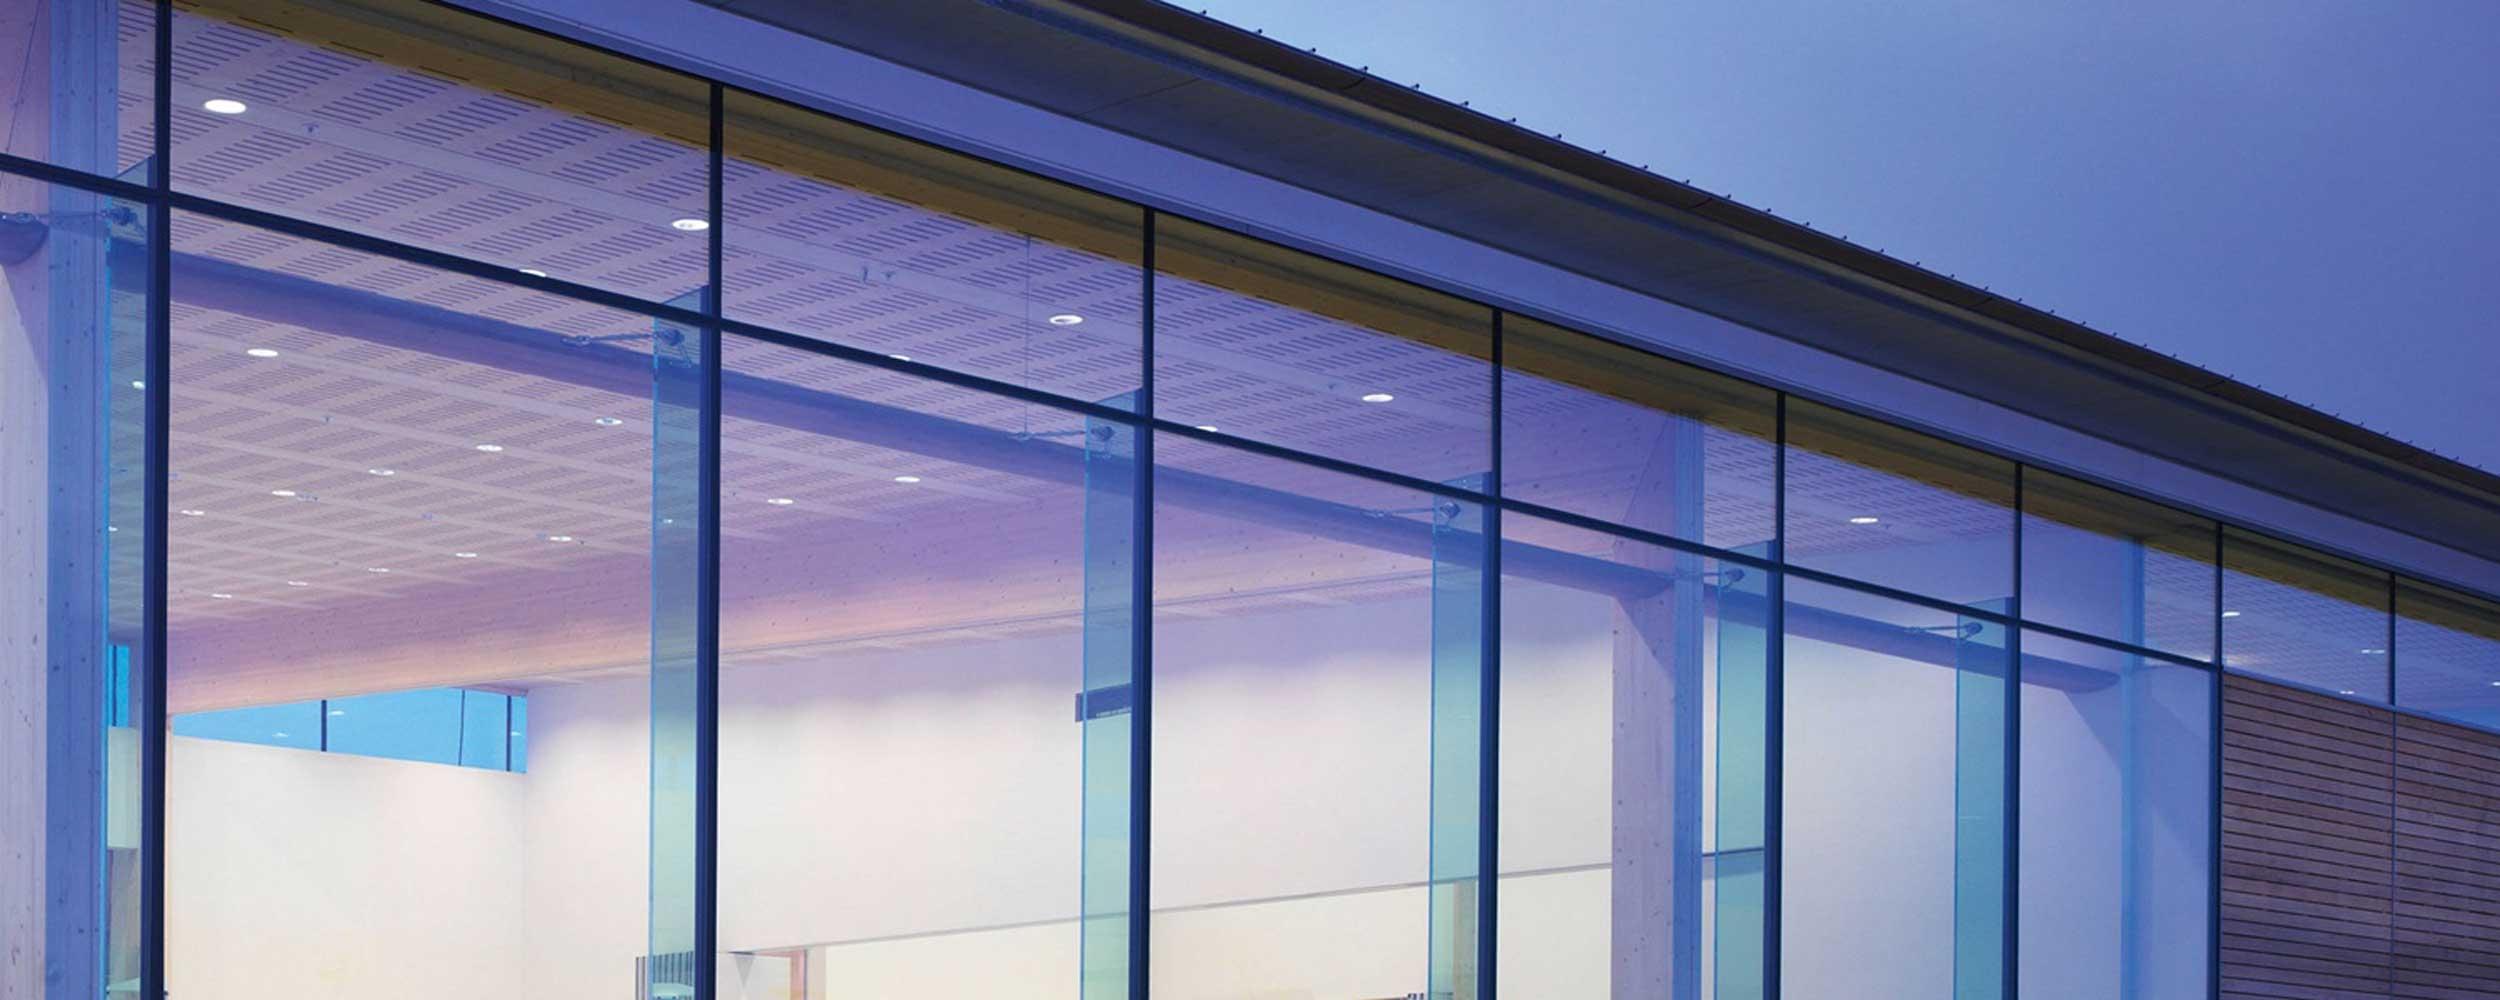 doors-windows-GAULHOFER-NATURELINE-WINDOWS-banner